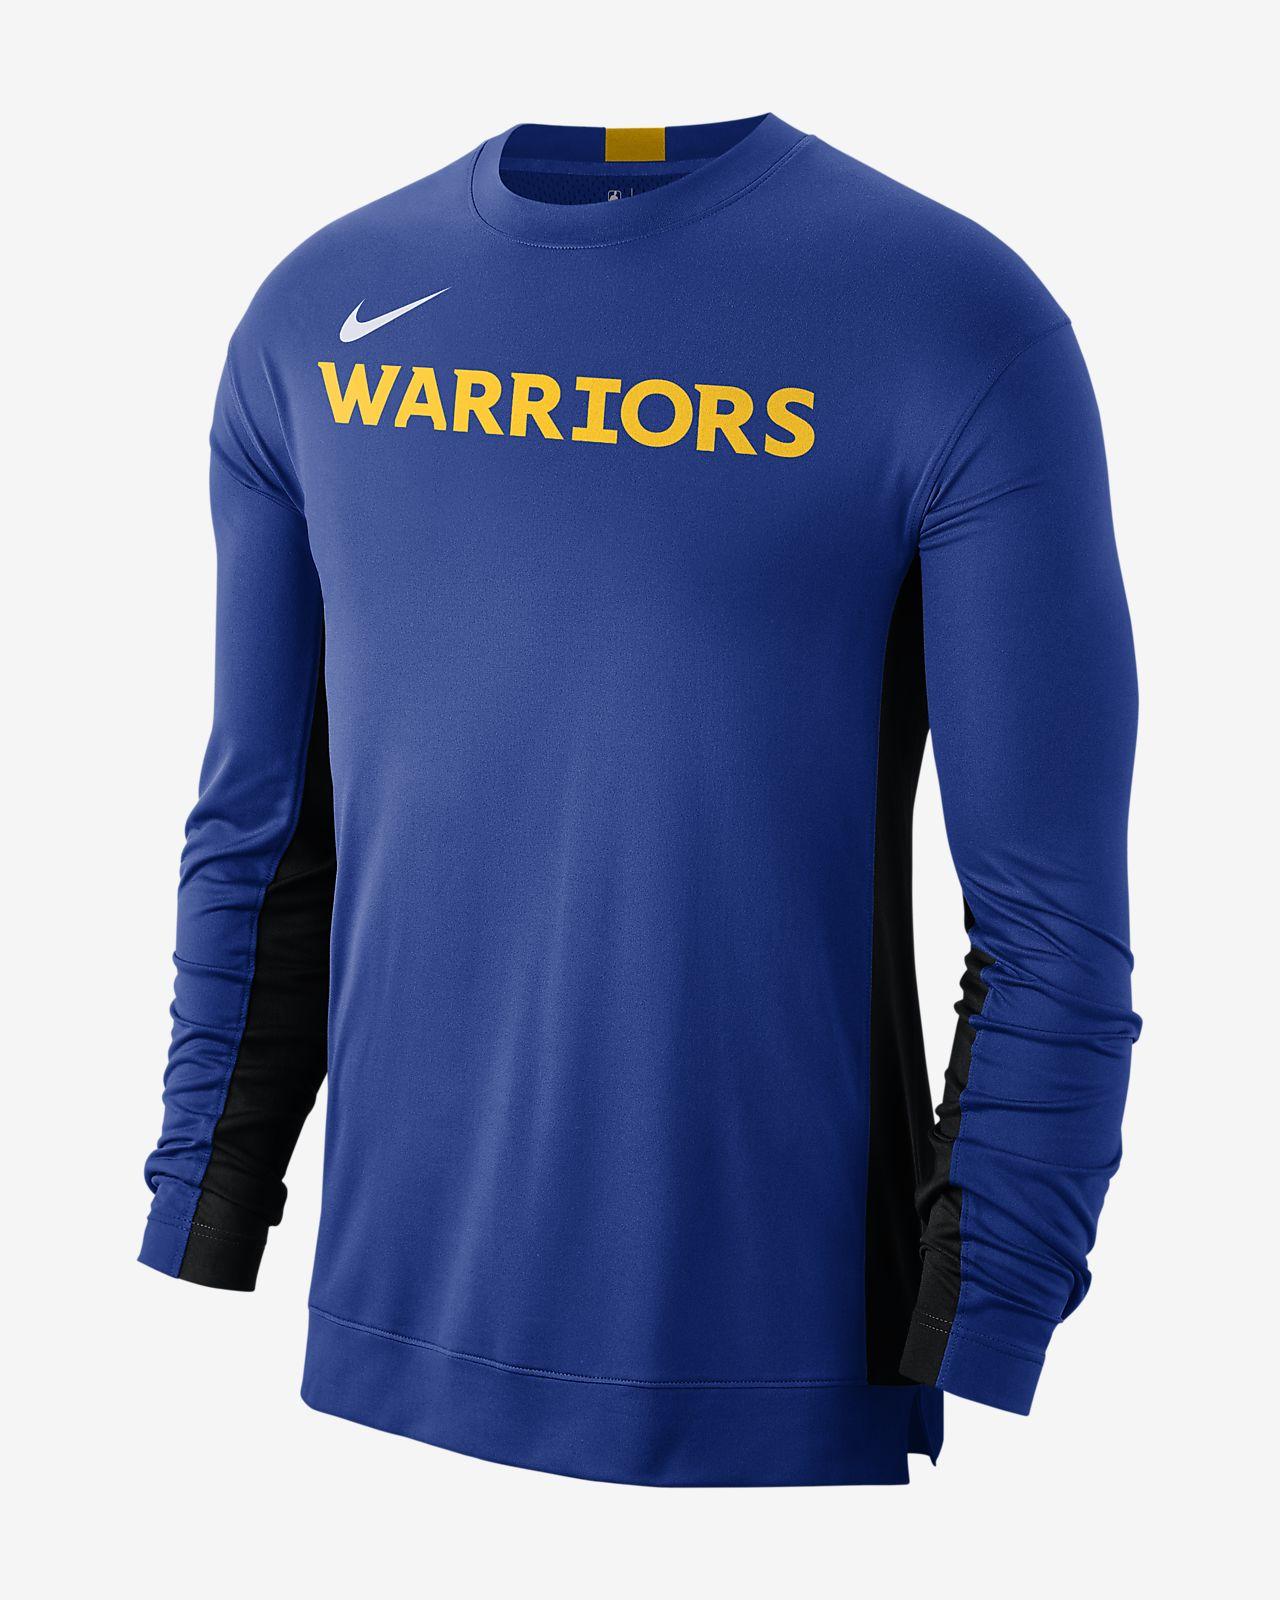 Golden State Warriors Nike Dri FIT Men's NBA Shooting Top